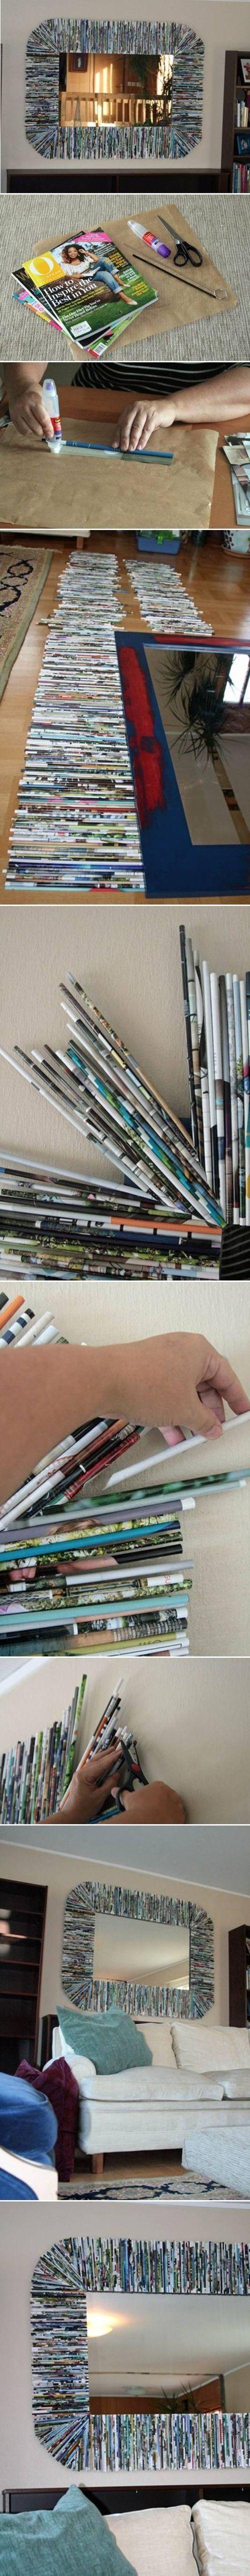 DIY Recycle Magazine Mirror Frame diy crafts craft ideas easy crafts diy ideas diy idea diy home easy diy for the home crafty decor home ideas diy decorations diy mirror